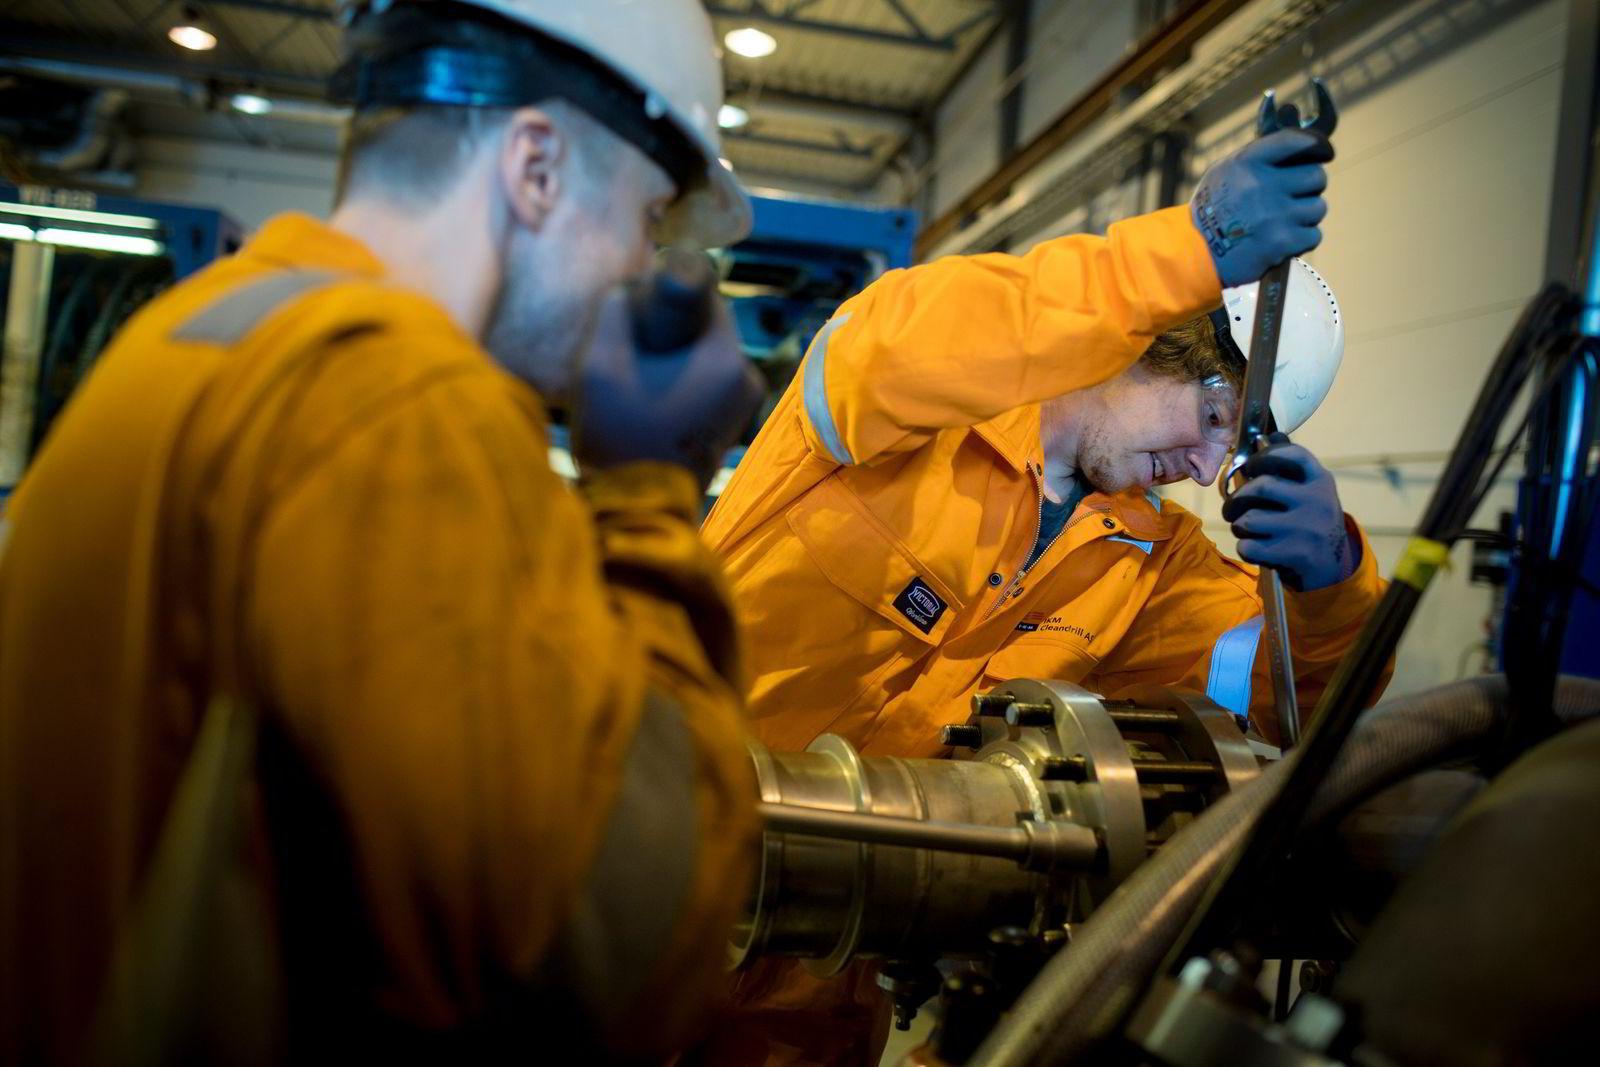 Endre Stamnes (til venstre) og Runar Lohne driver vedlikehold på pumpen som pumper boreslammet opp til overflaten.